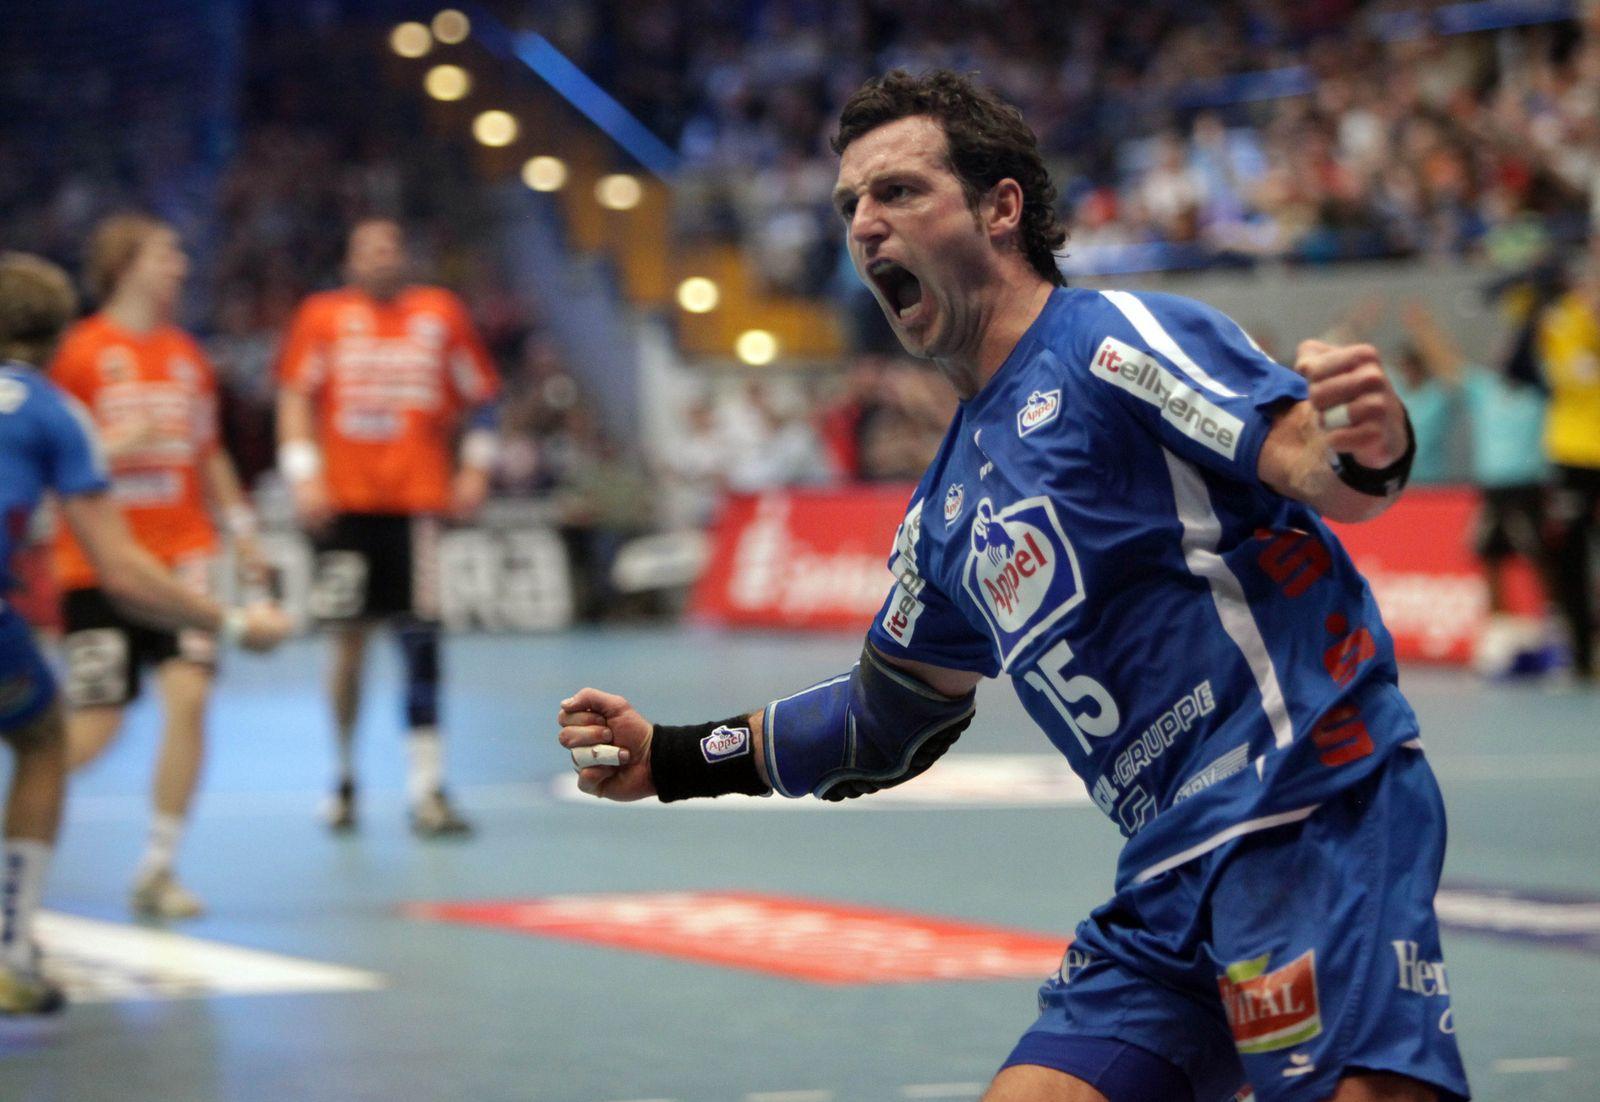 EHF-Pokal Finale - TBV Lemgo - Kadetten Schaffhausen